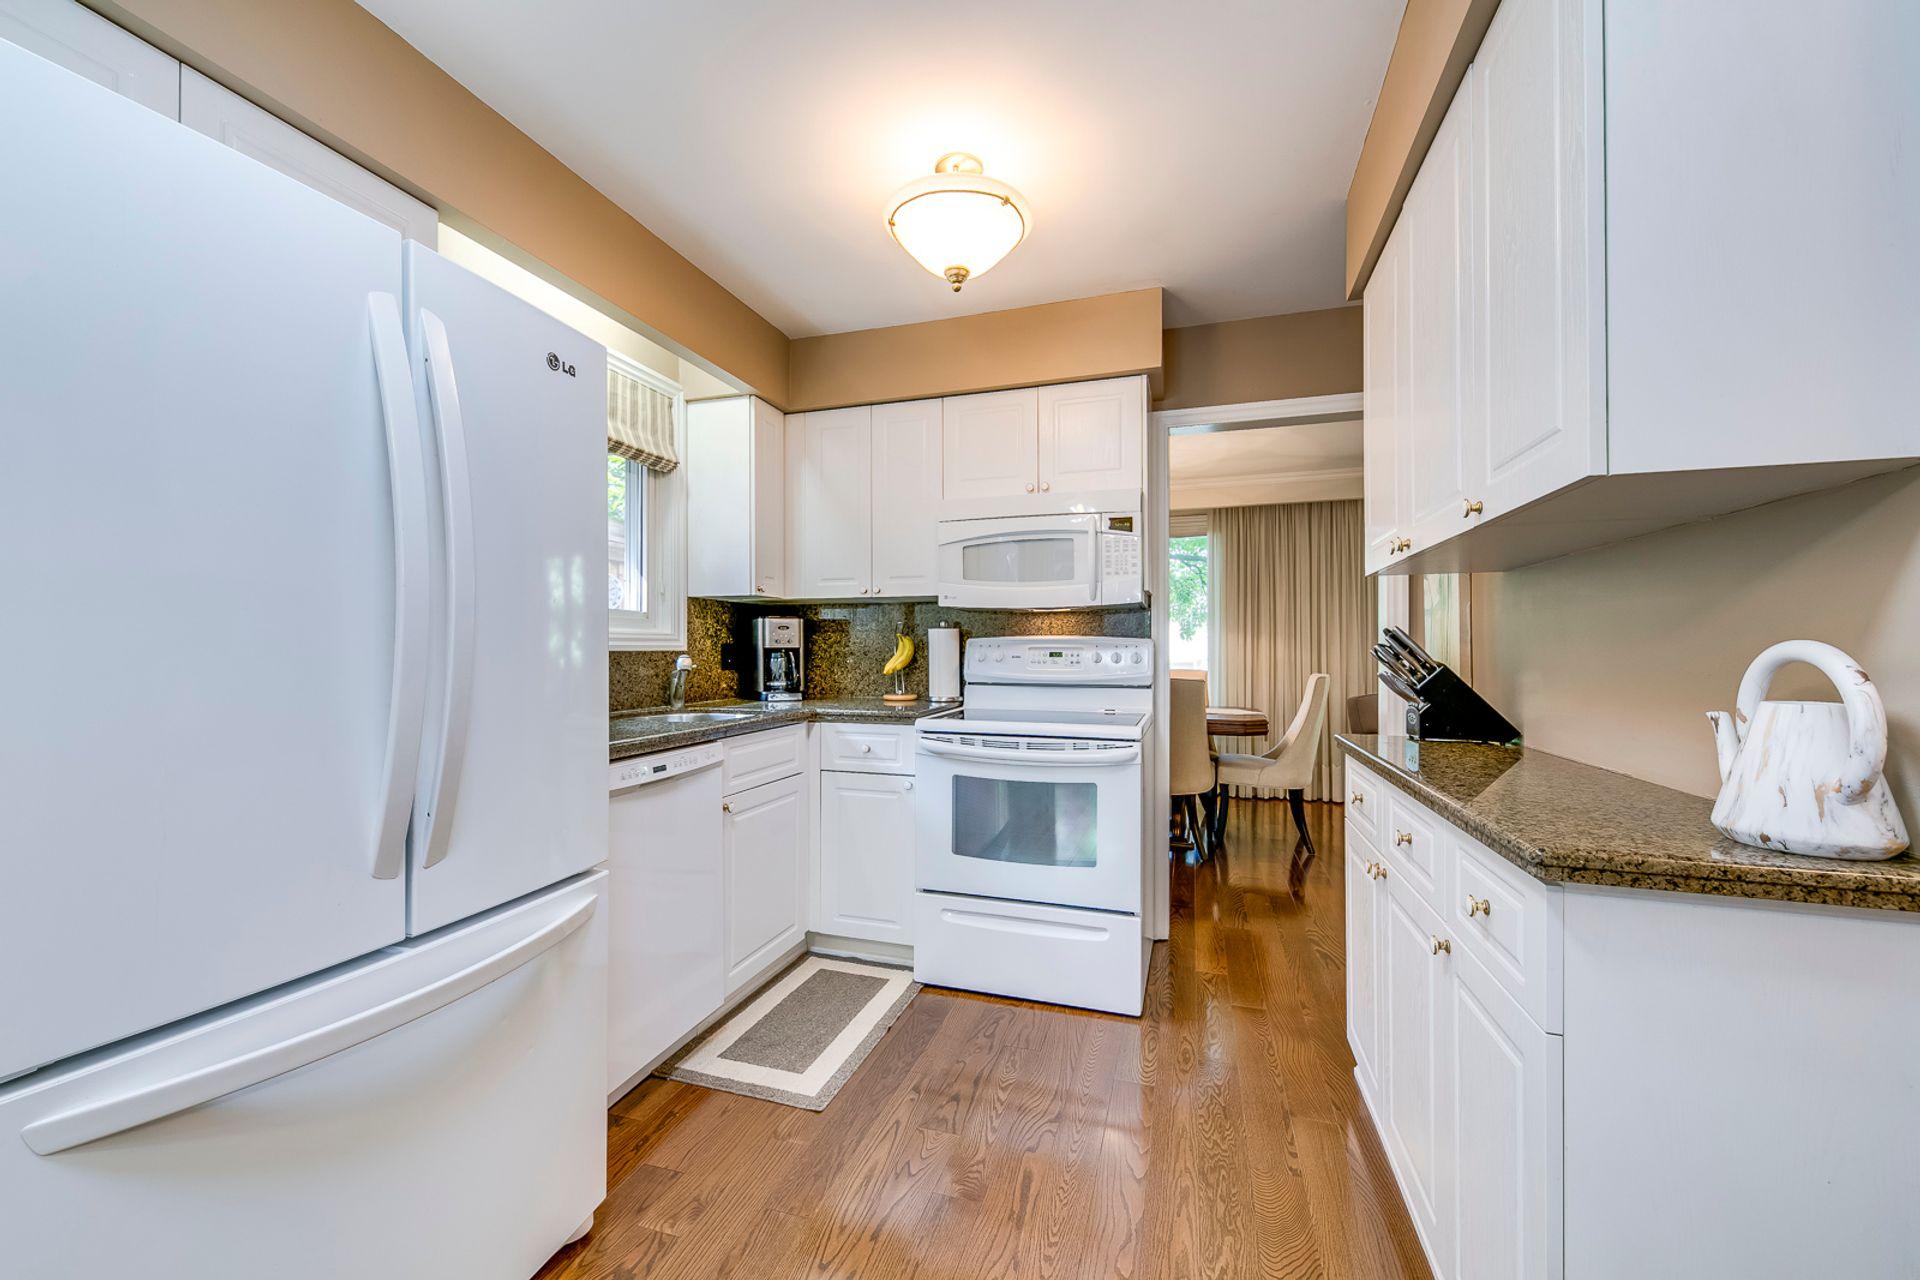 Kitchen - 1246 Landfair Cres, Oakville - Elite3 & Team at 1246 Landfair Crescent, Iroquois Ridge South, Oakville